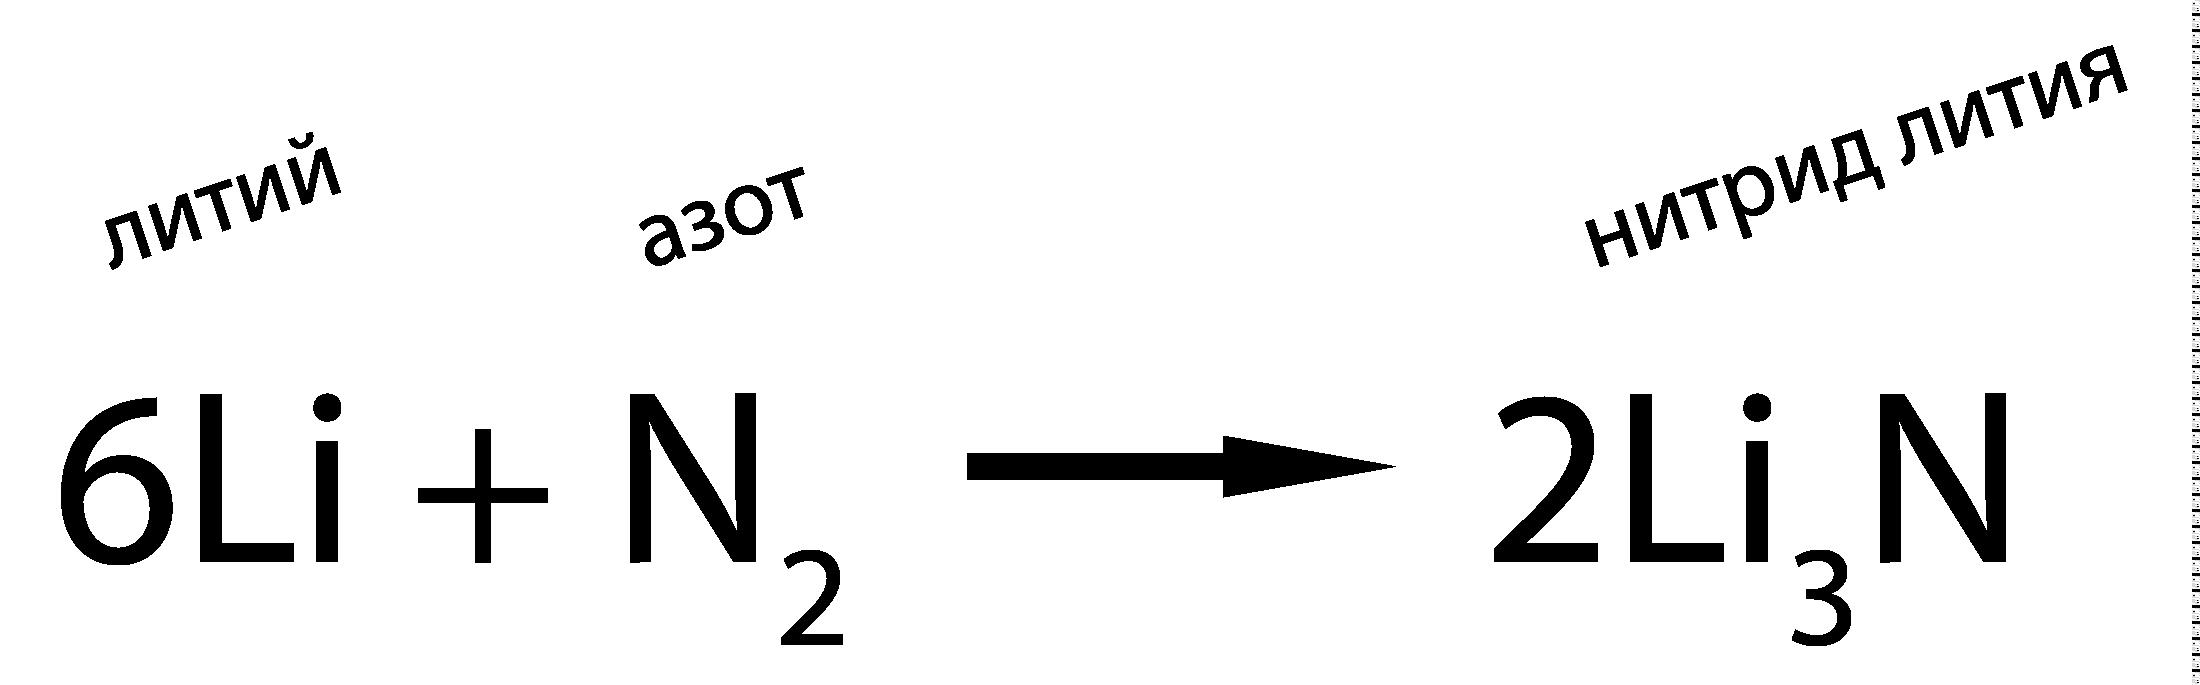 азот реагирует с металлами и водородом